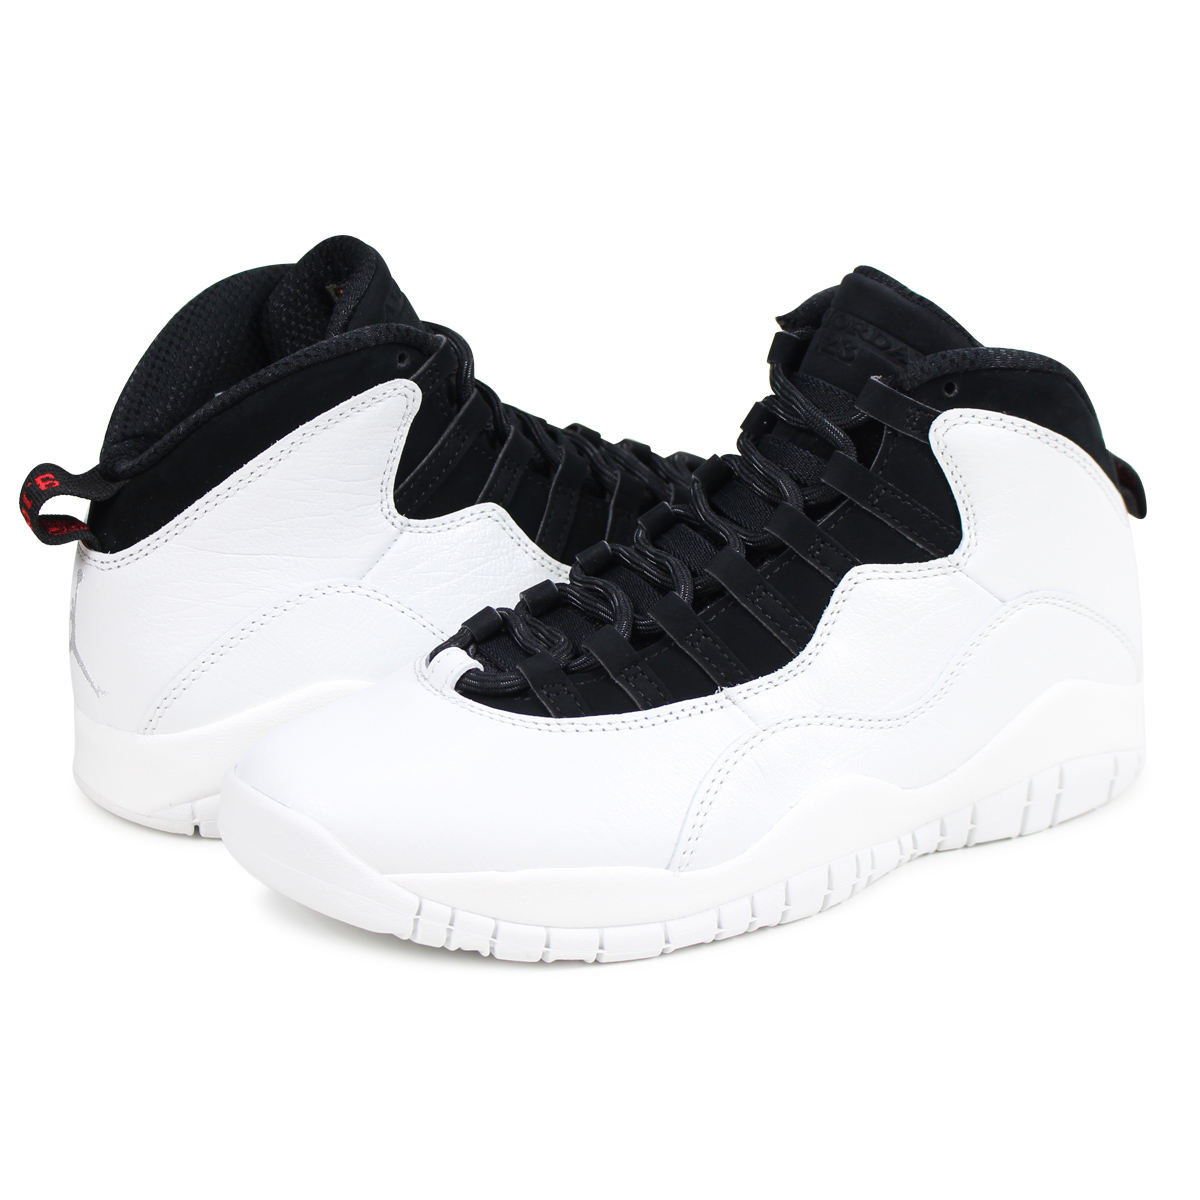 separation shoes 1aa44 5f133 NIKE AIR JORDAN 10 RETRO I M BACK Nike Air Jordan 10 nostalgic sneakers men  ...